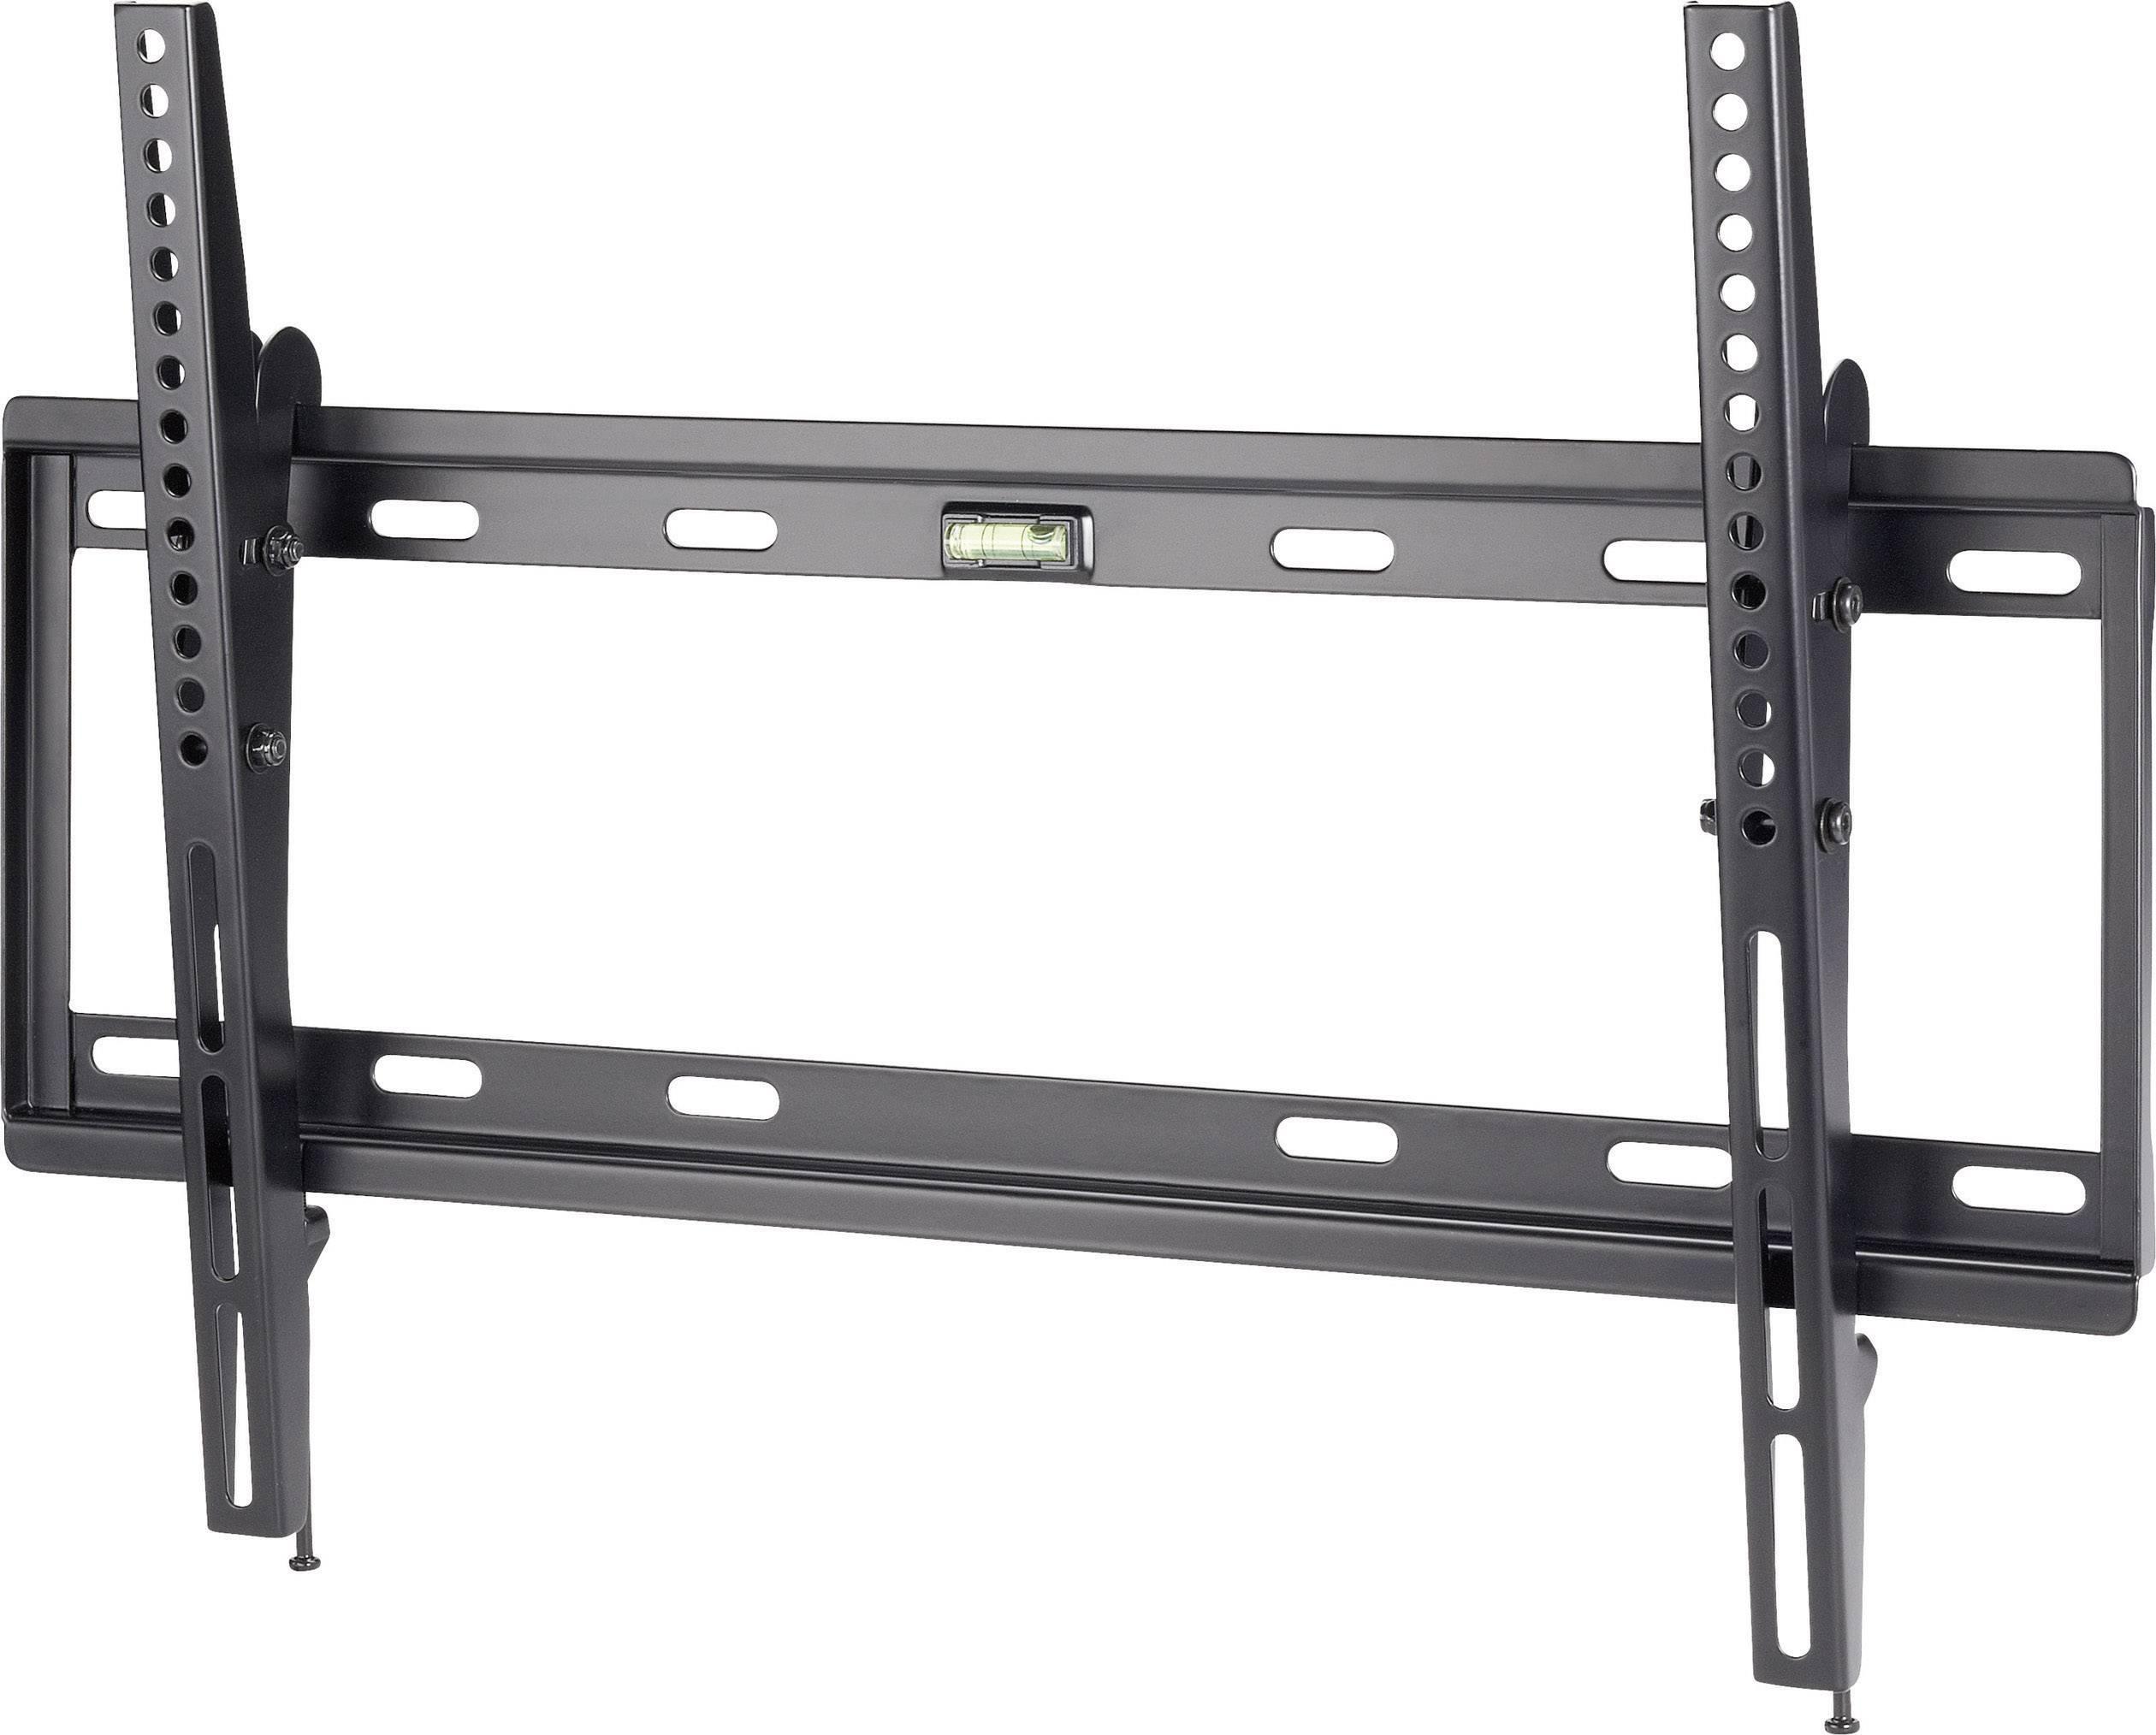 "TV držiak na stenu SpeaKa Professional 527506, sklápajúci, 81,3 cm (32"") - 160,0 cm (63"")"